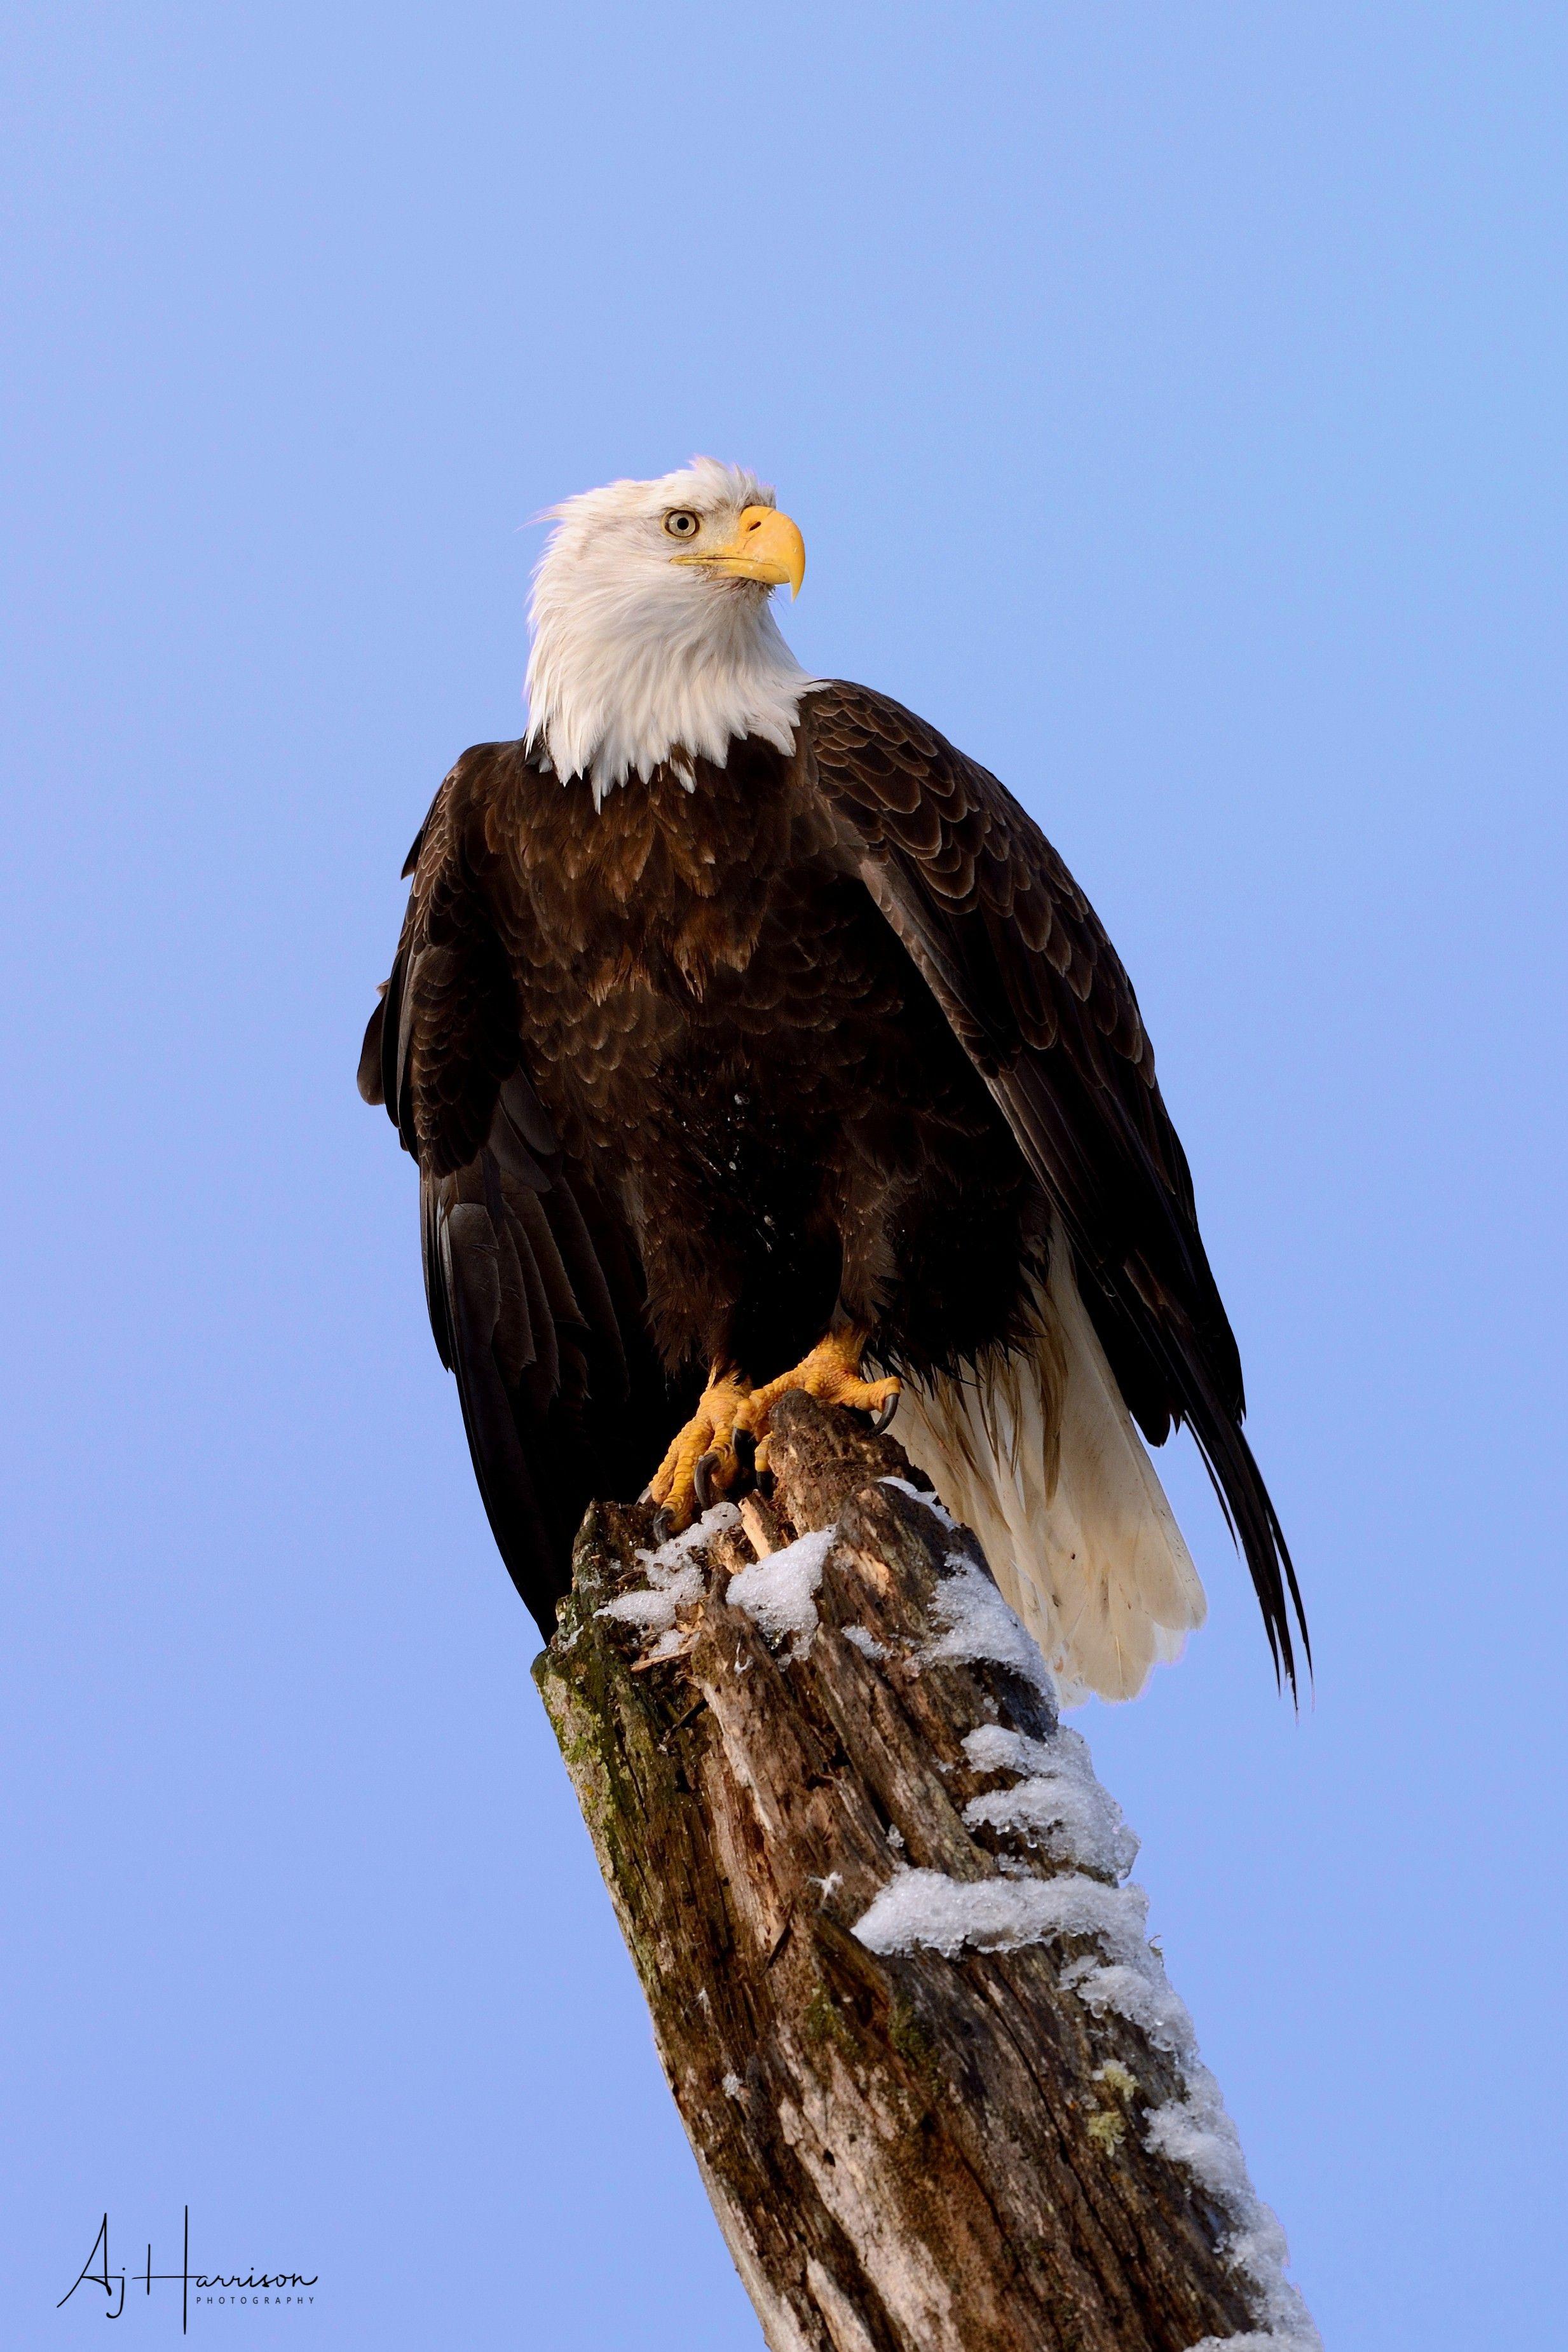 Bald eagle perched against blue sky